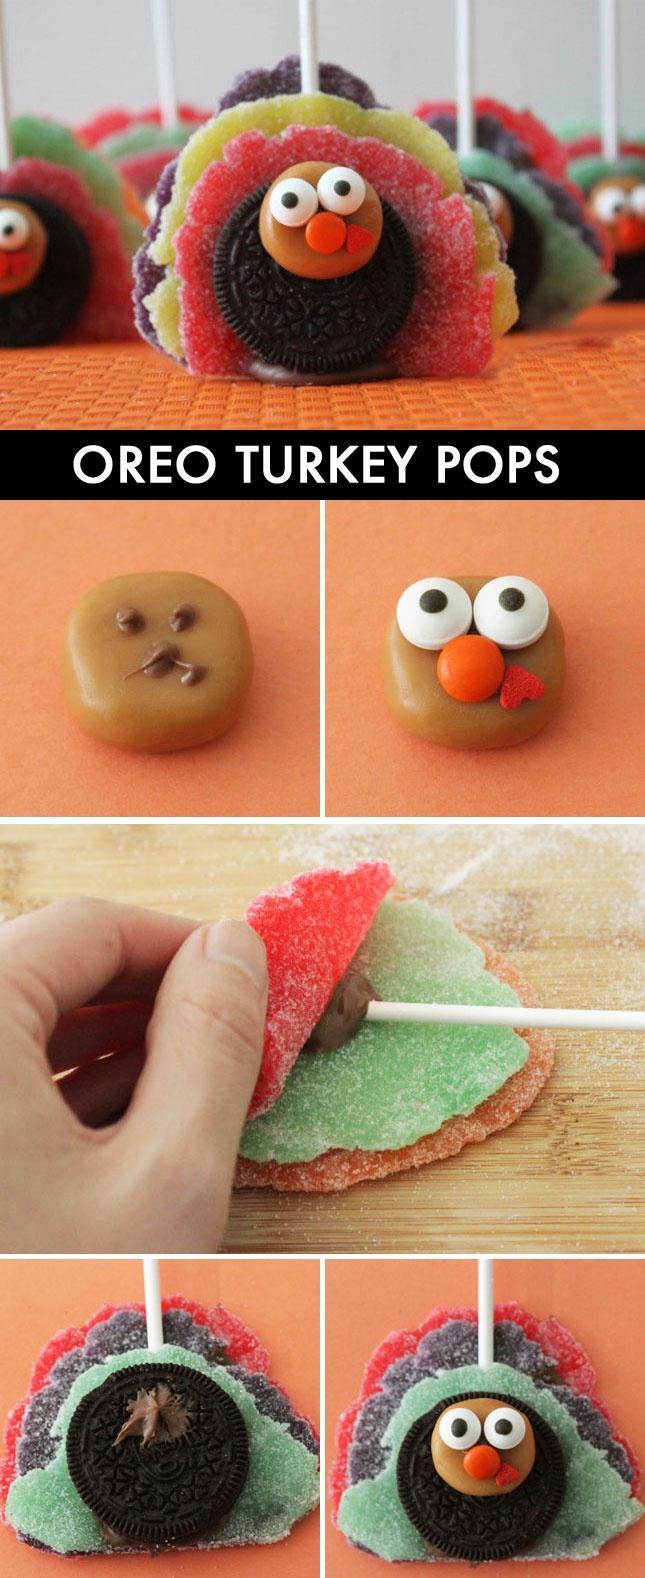 Oreo Turkey Pops - fun!!